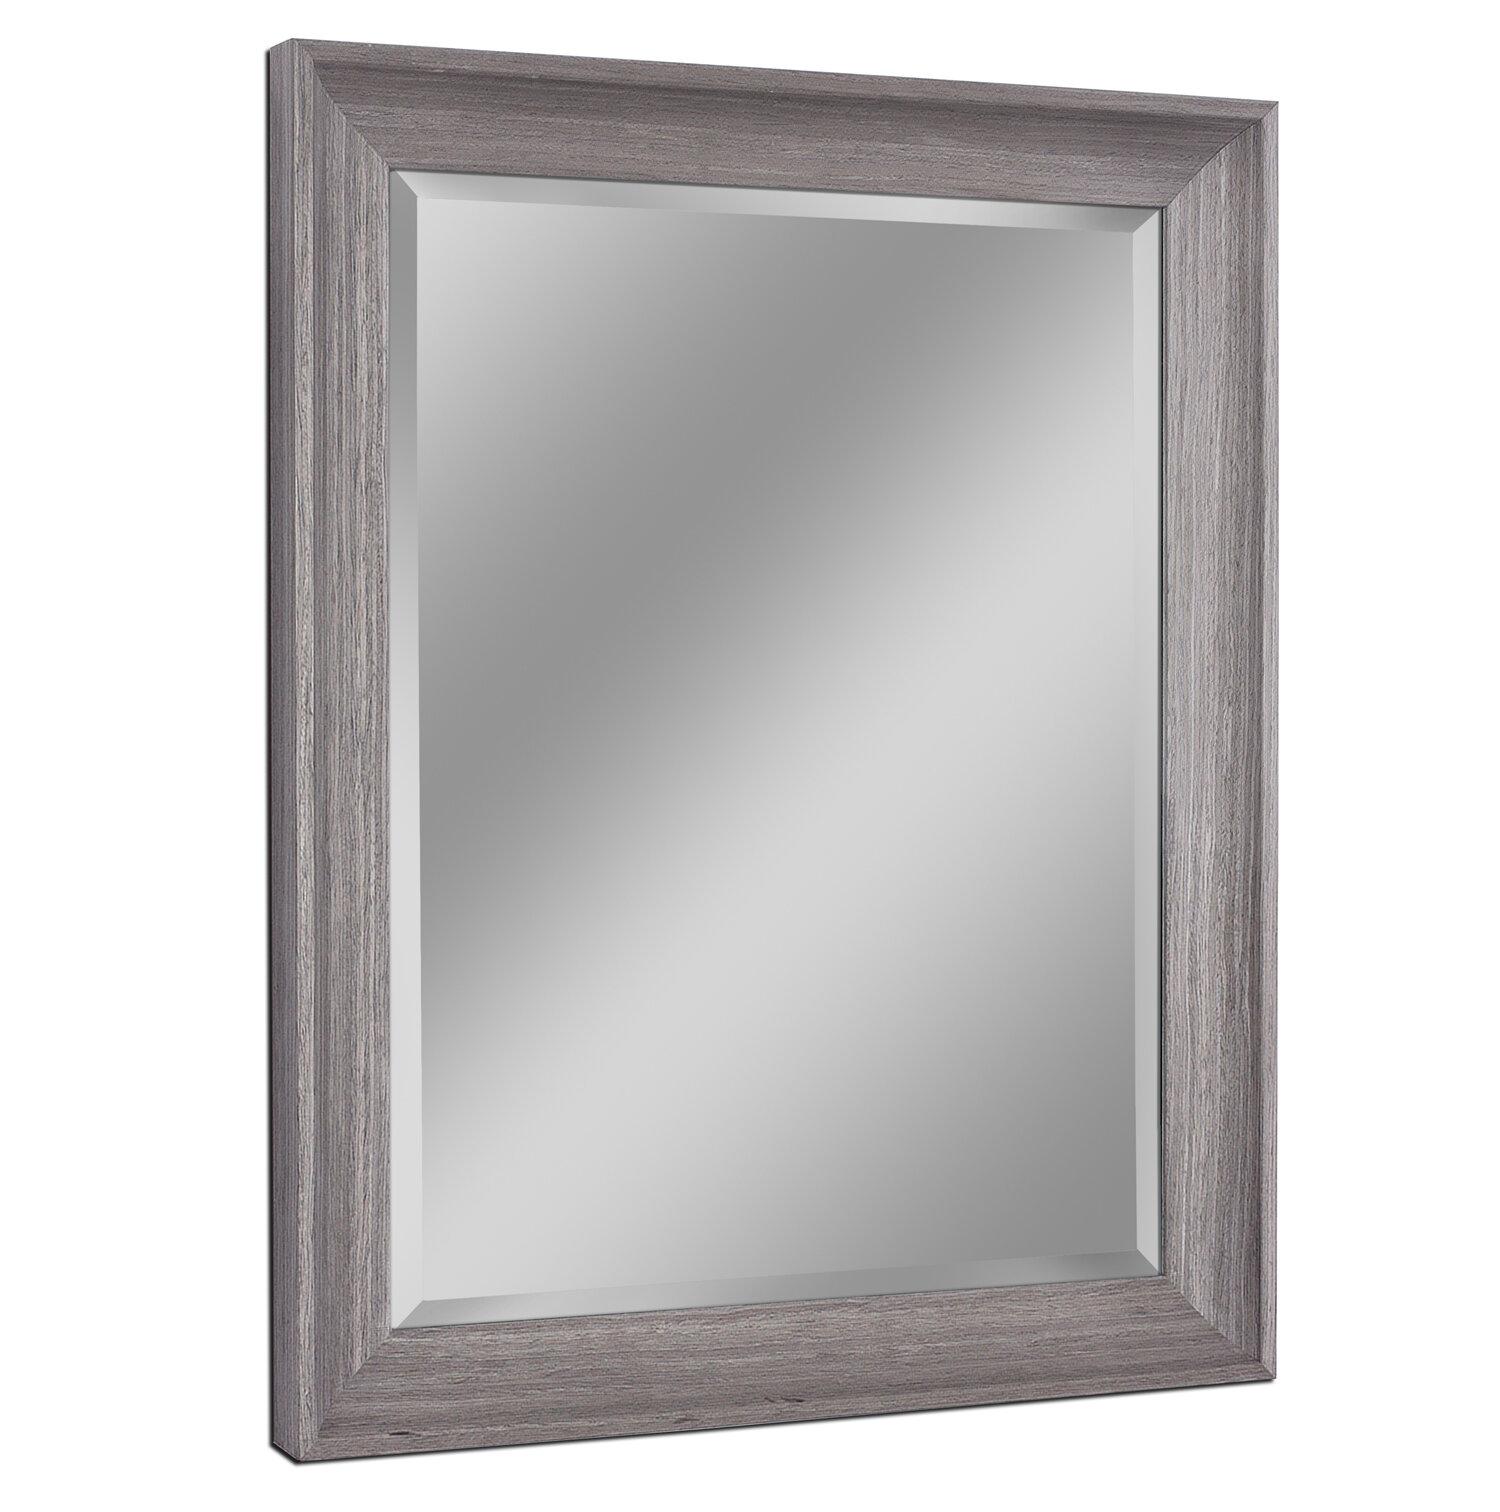 Bartouille Transitional Driftwood Beveled Bathroom Vanity Wall Mirror